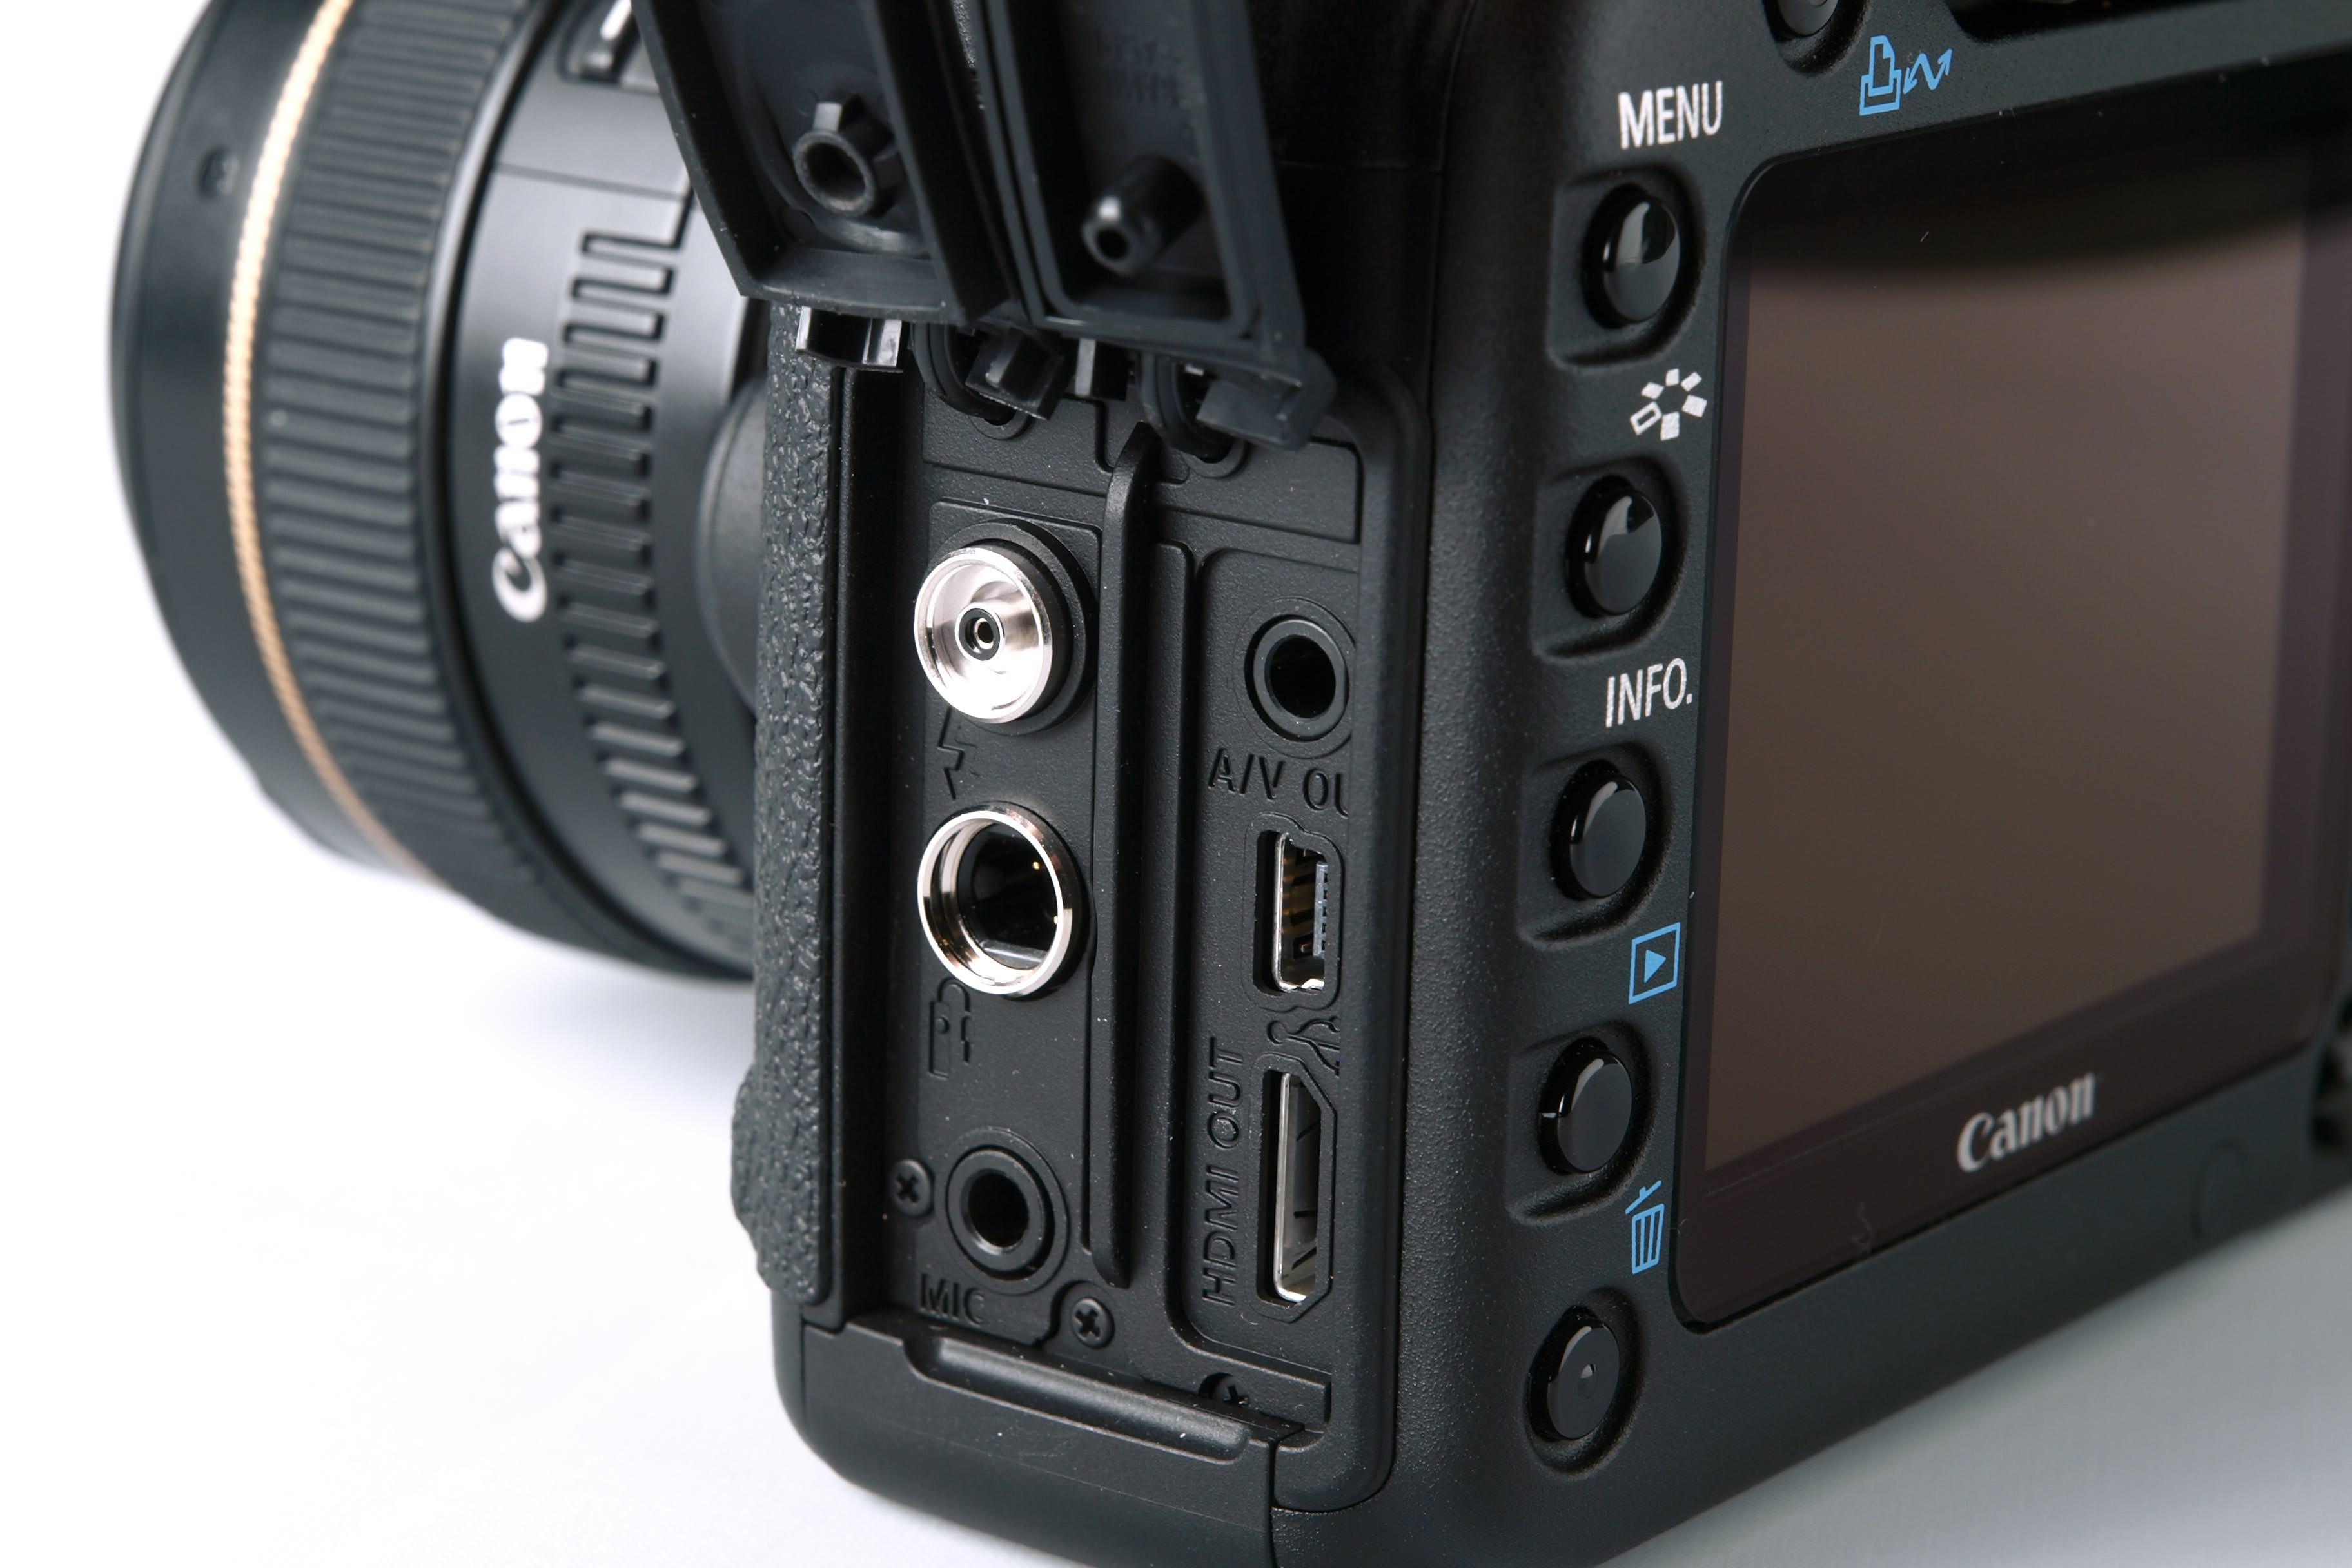 canon eos 5d mkii digital slr review rh ephotozine com canon 5d mark ii user manual video canon 5d mark ii user manual pdf